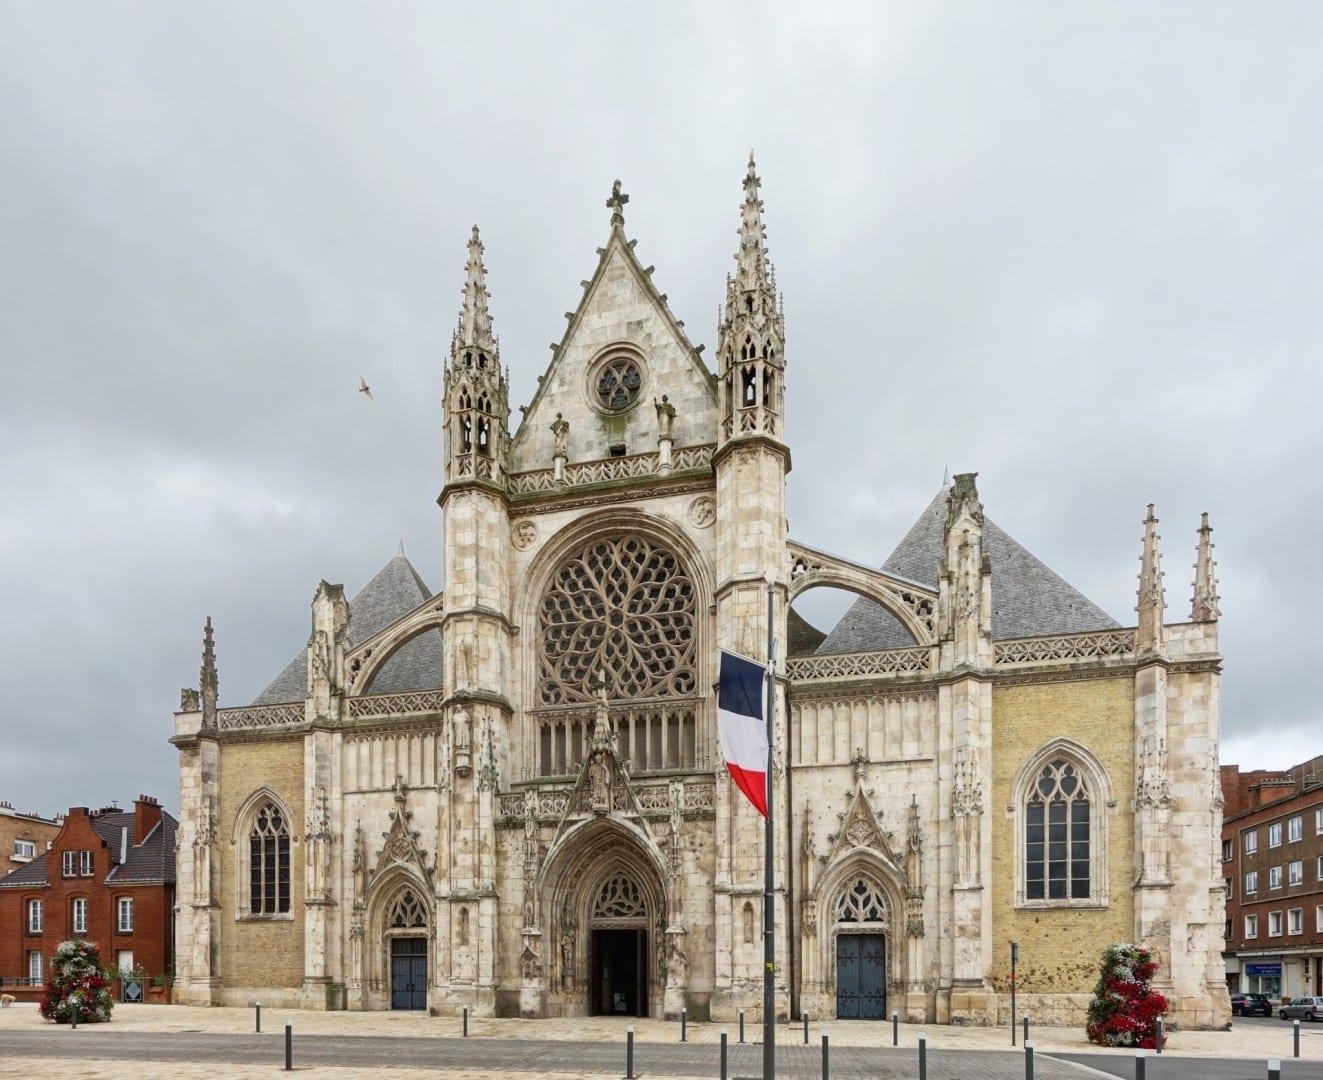 Fachada de la iglesia de Saint-Éloi Dunkerque Francia